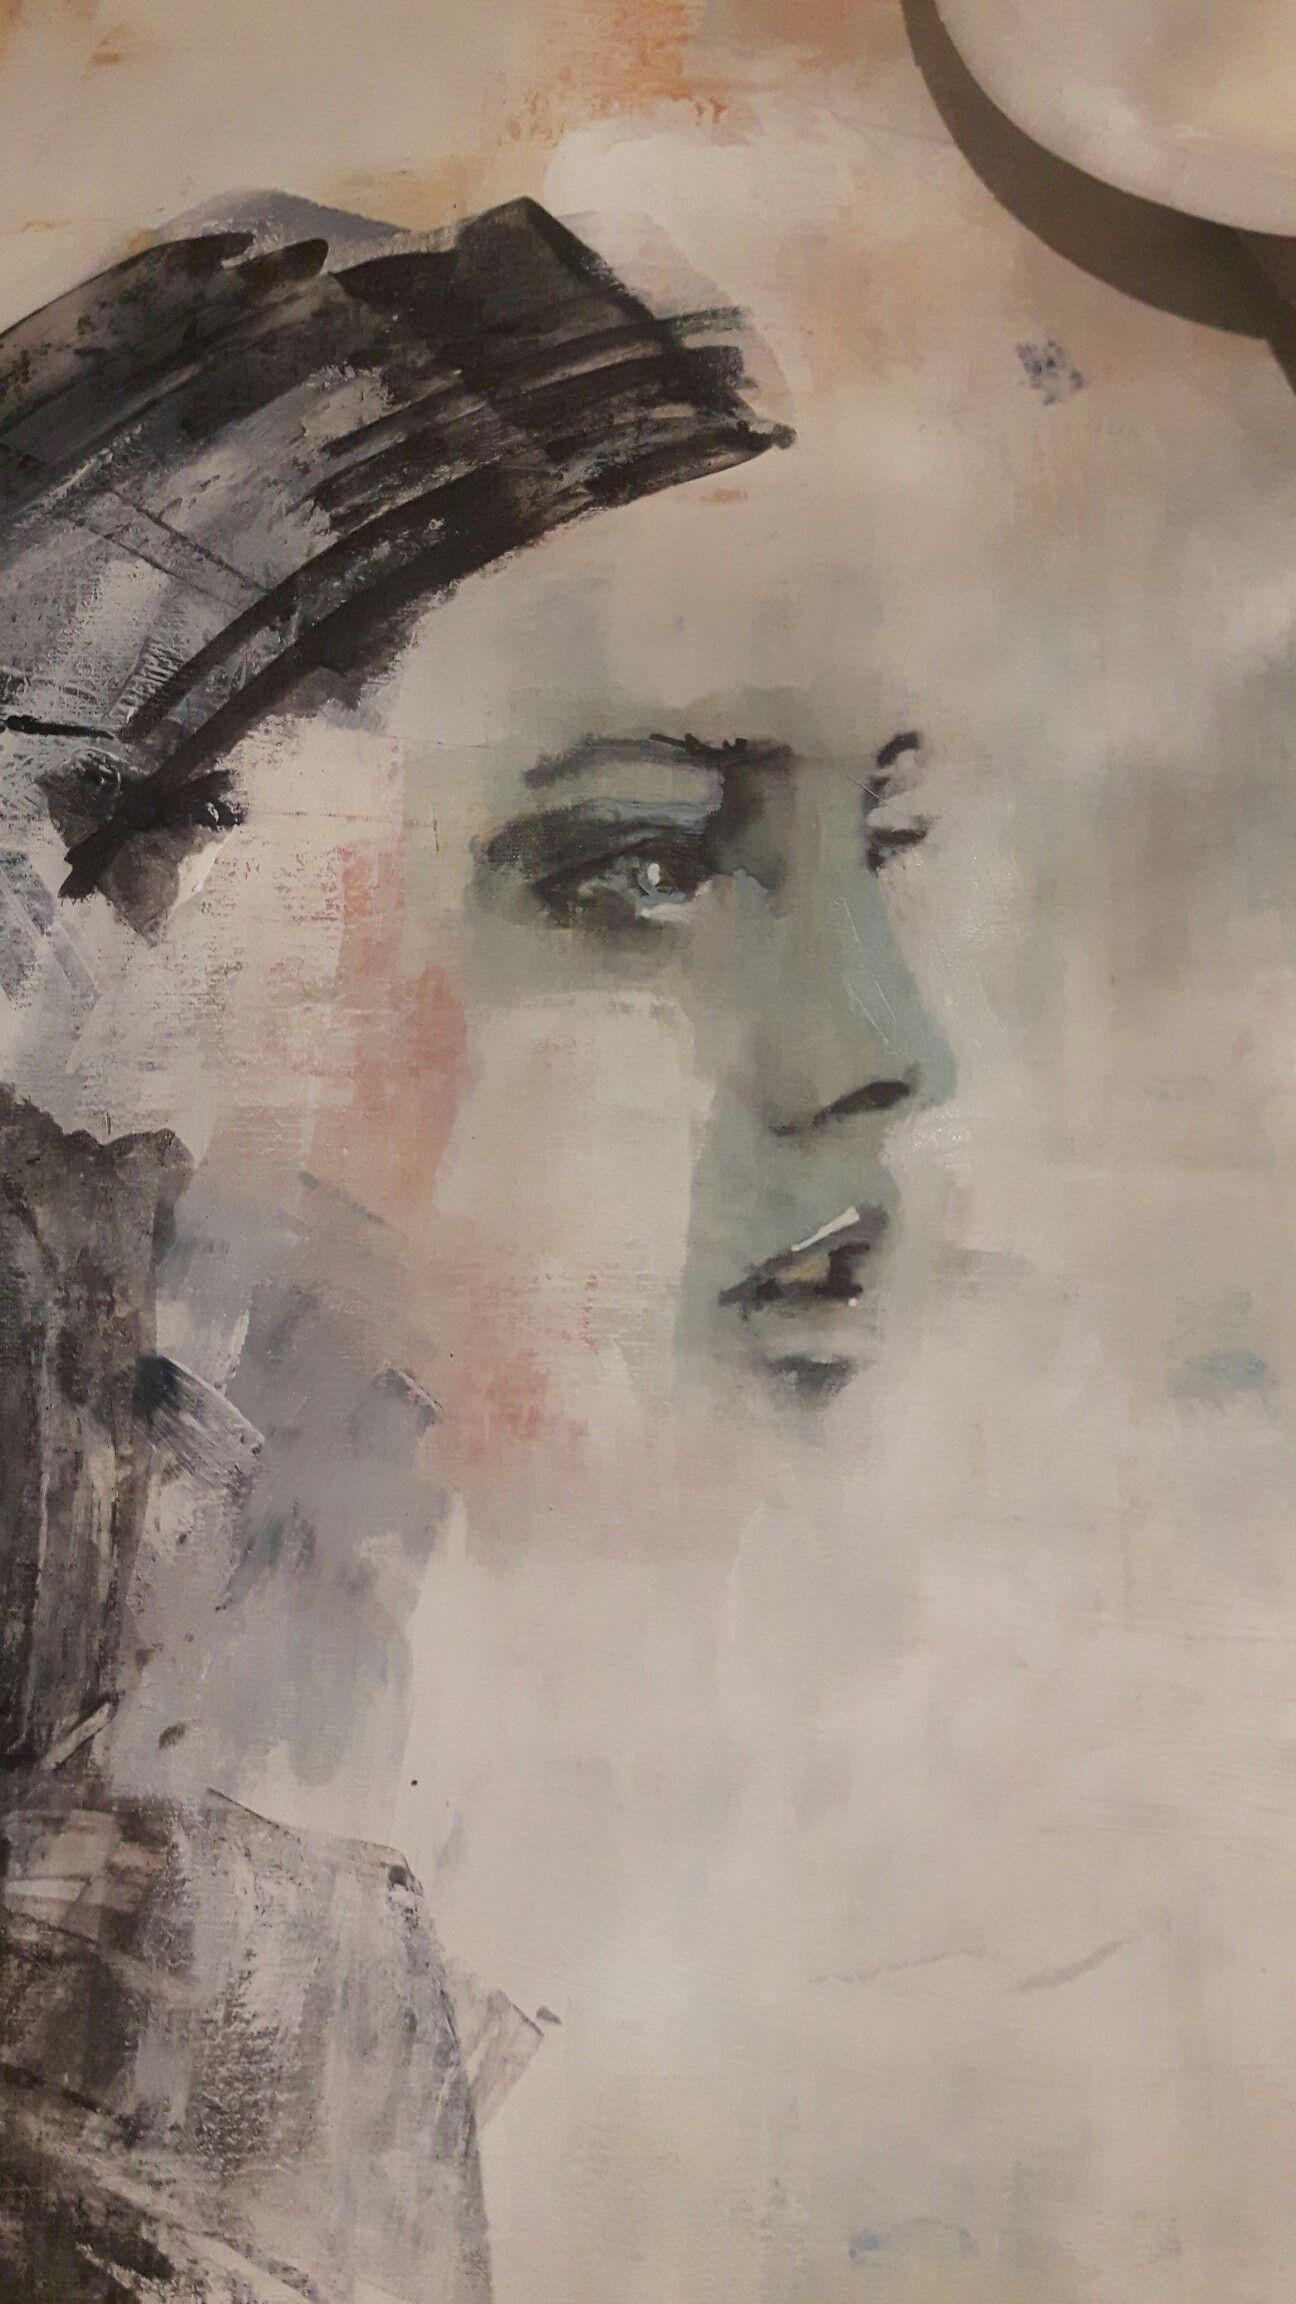 Work in progress. #art #acrylic #painting #portrait #frankforsman #picturesbyfrank #inprogress #process #progress